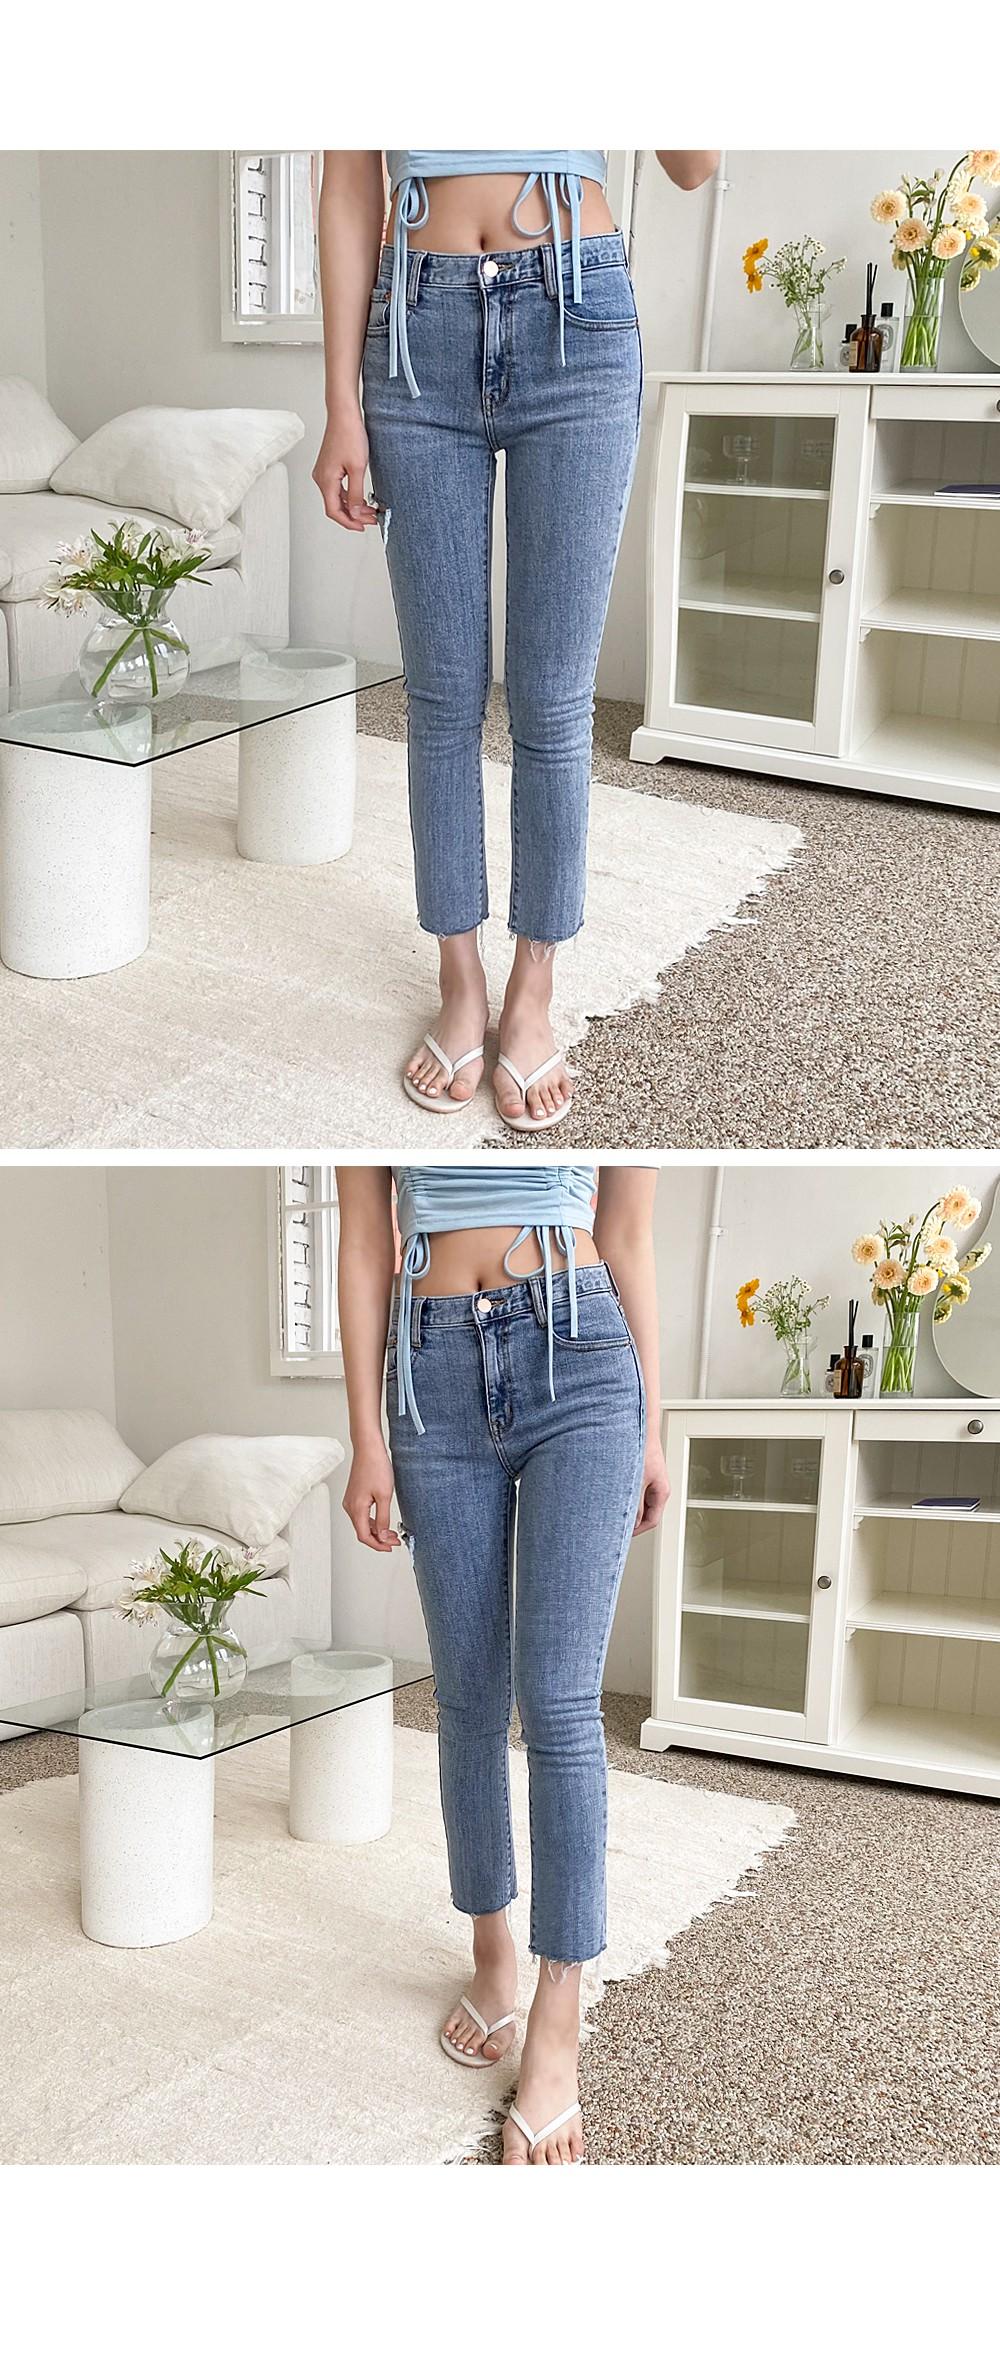 honey thigh slit jeans